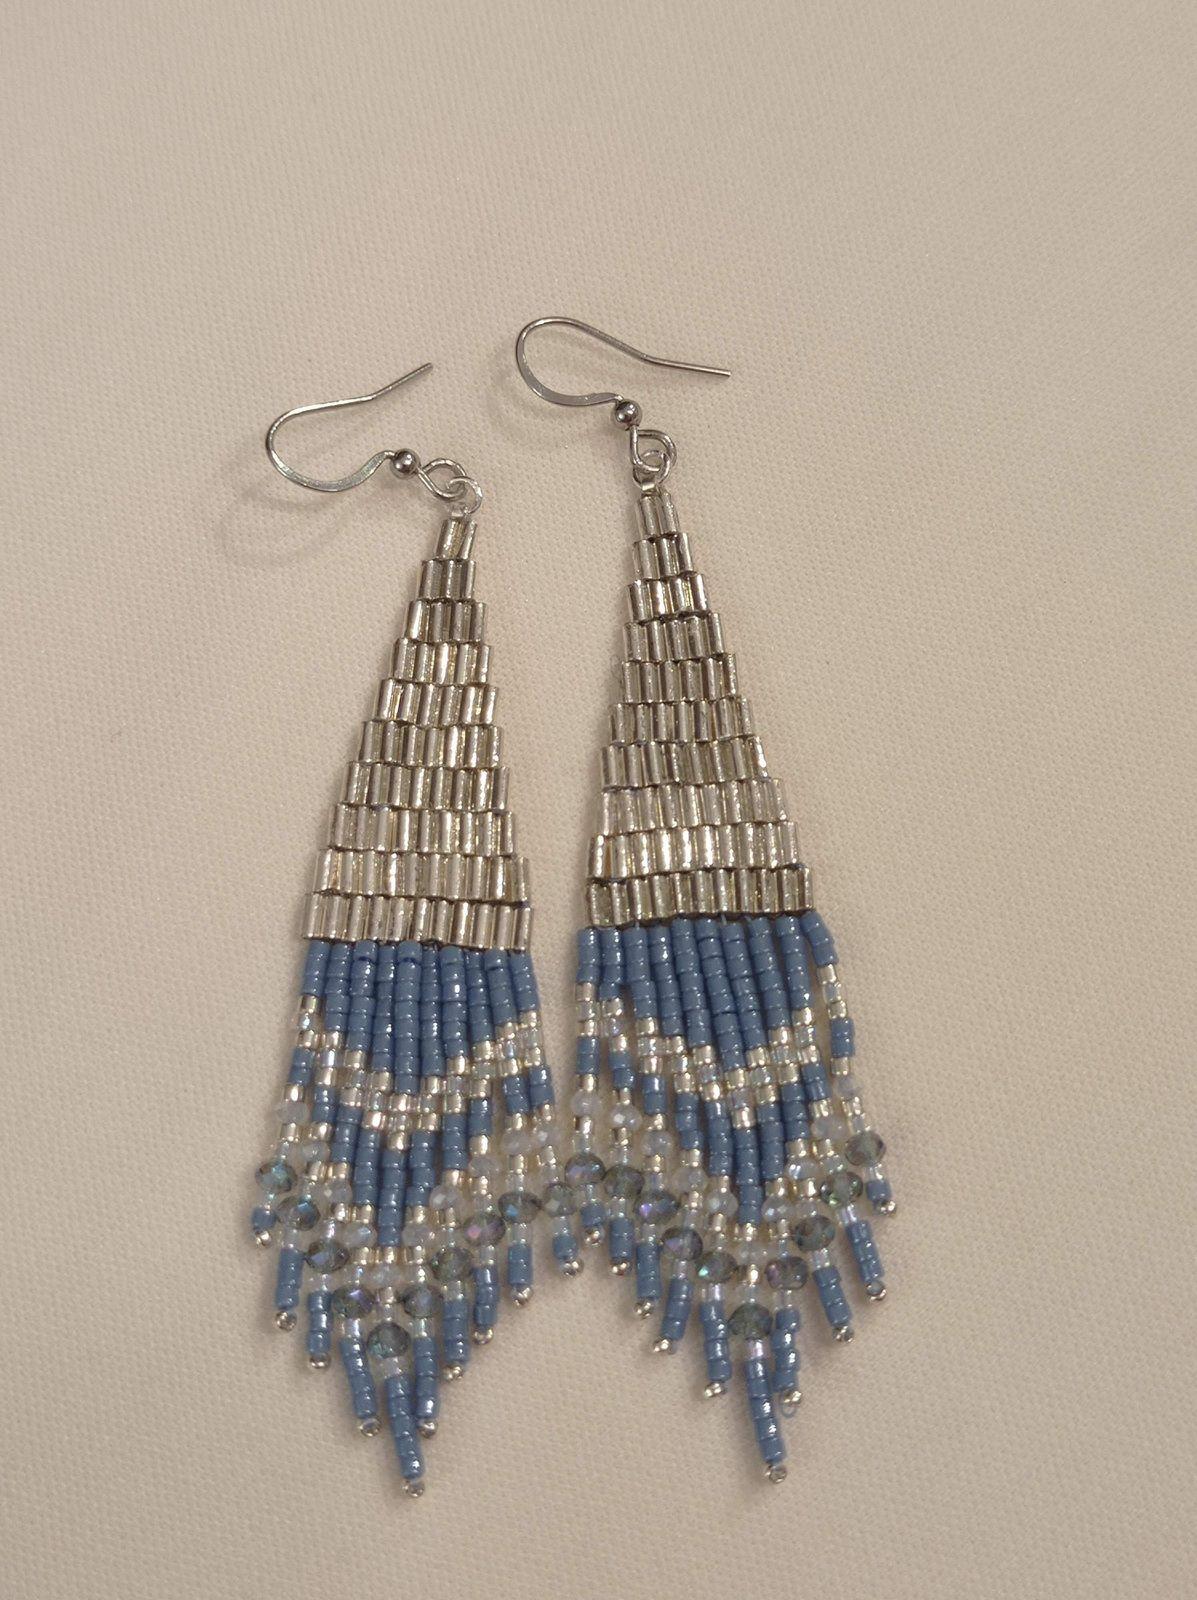 REF.VN236- BO perles de verre, cristal, crochets en acier chirurgical, long. 8,6cm, larg. 1,6cm. 25€.